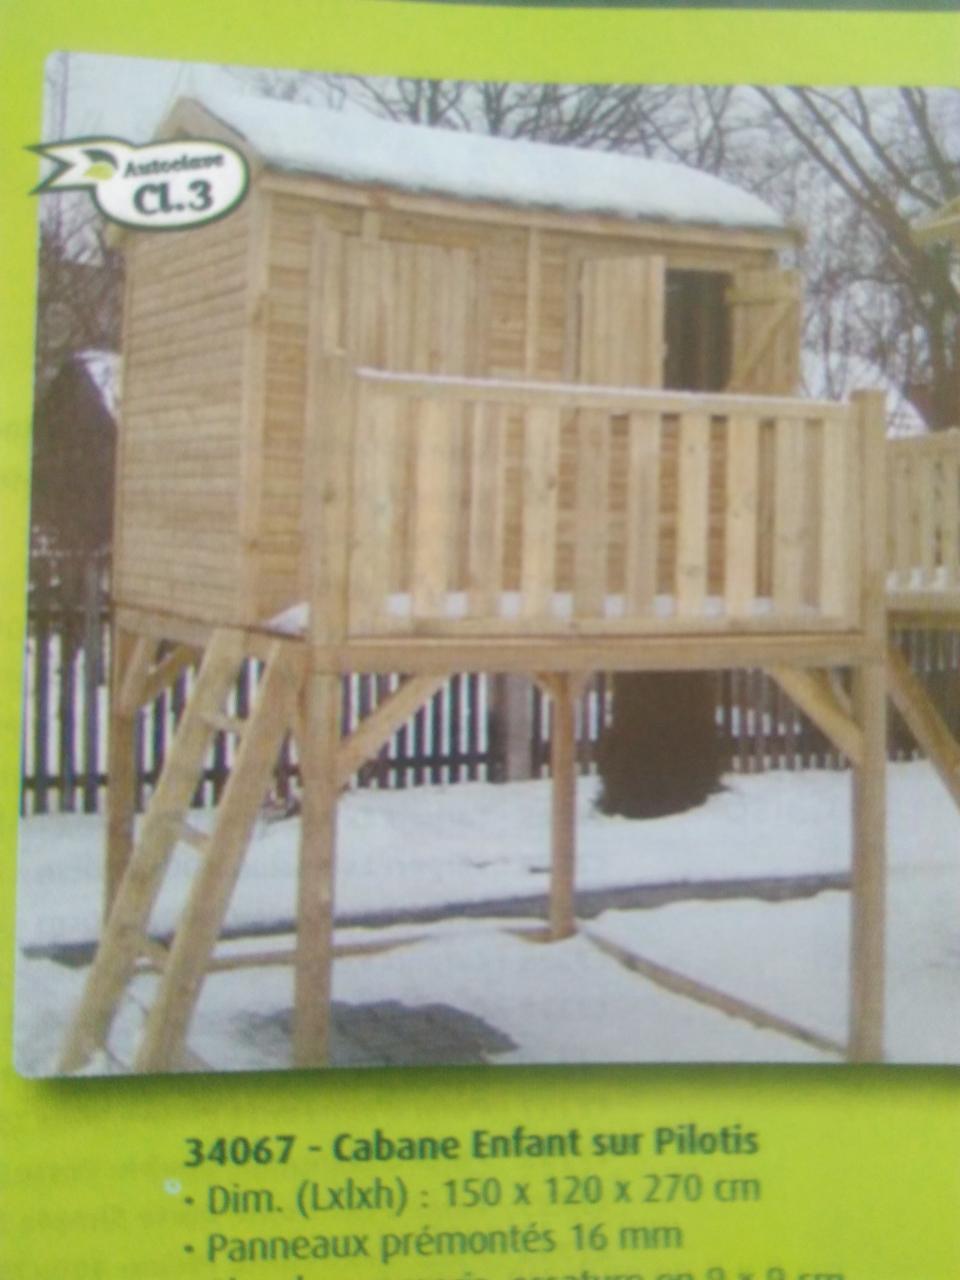 cabane enfant sur pilotis cabanes enfant 27 flbc. Black Bedroom Furniture Sets. Home Design Ideas